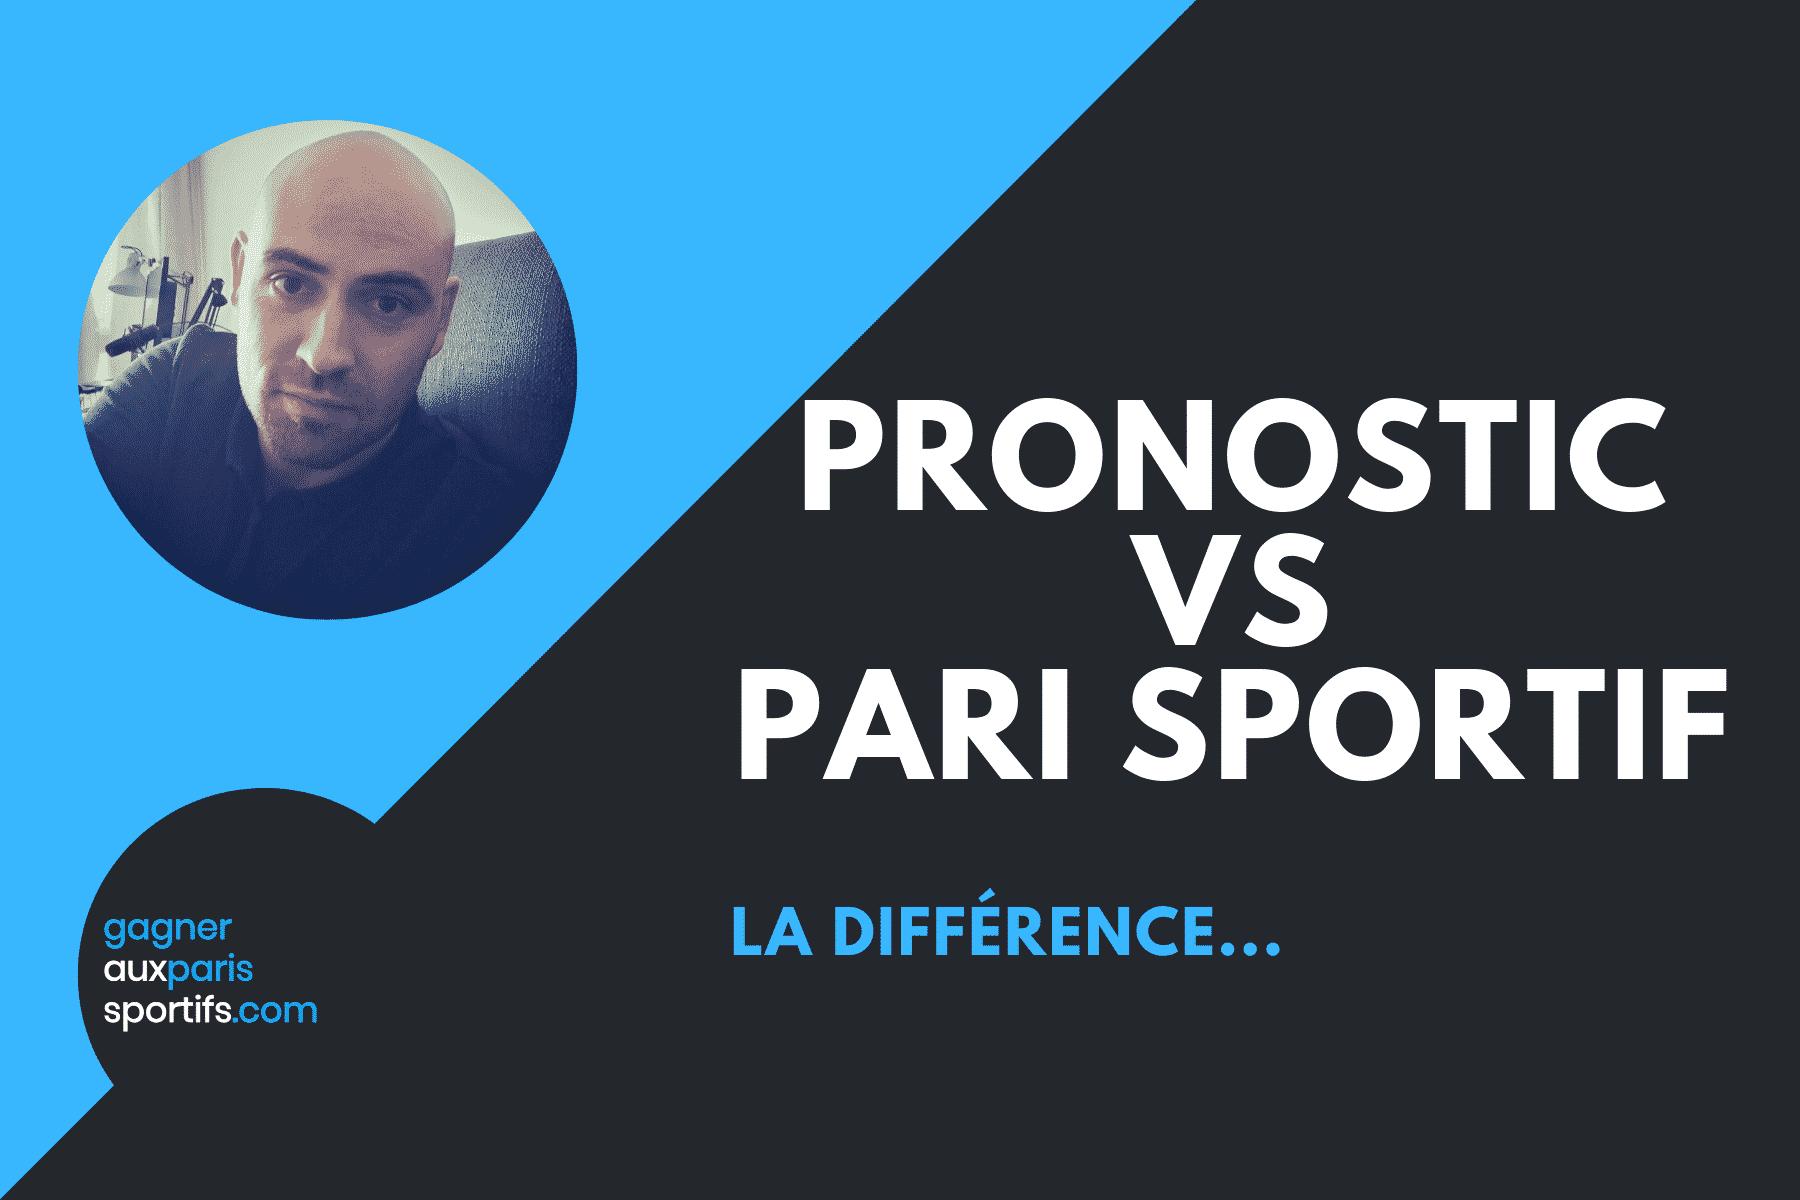 Pronostic vs Pari sportif La différence